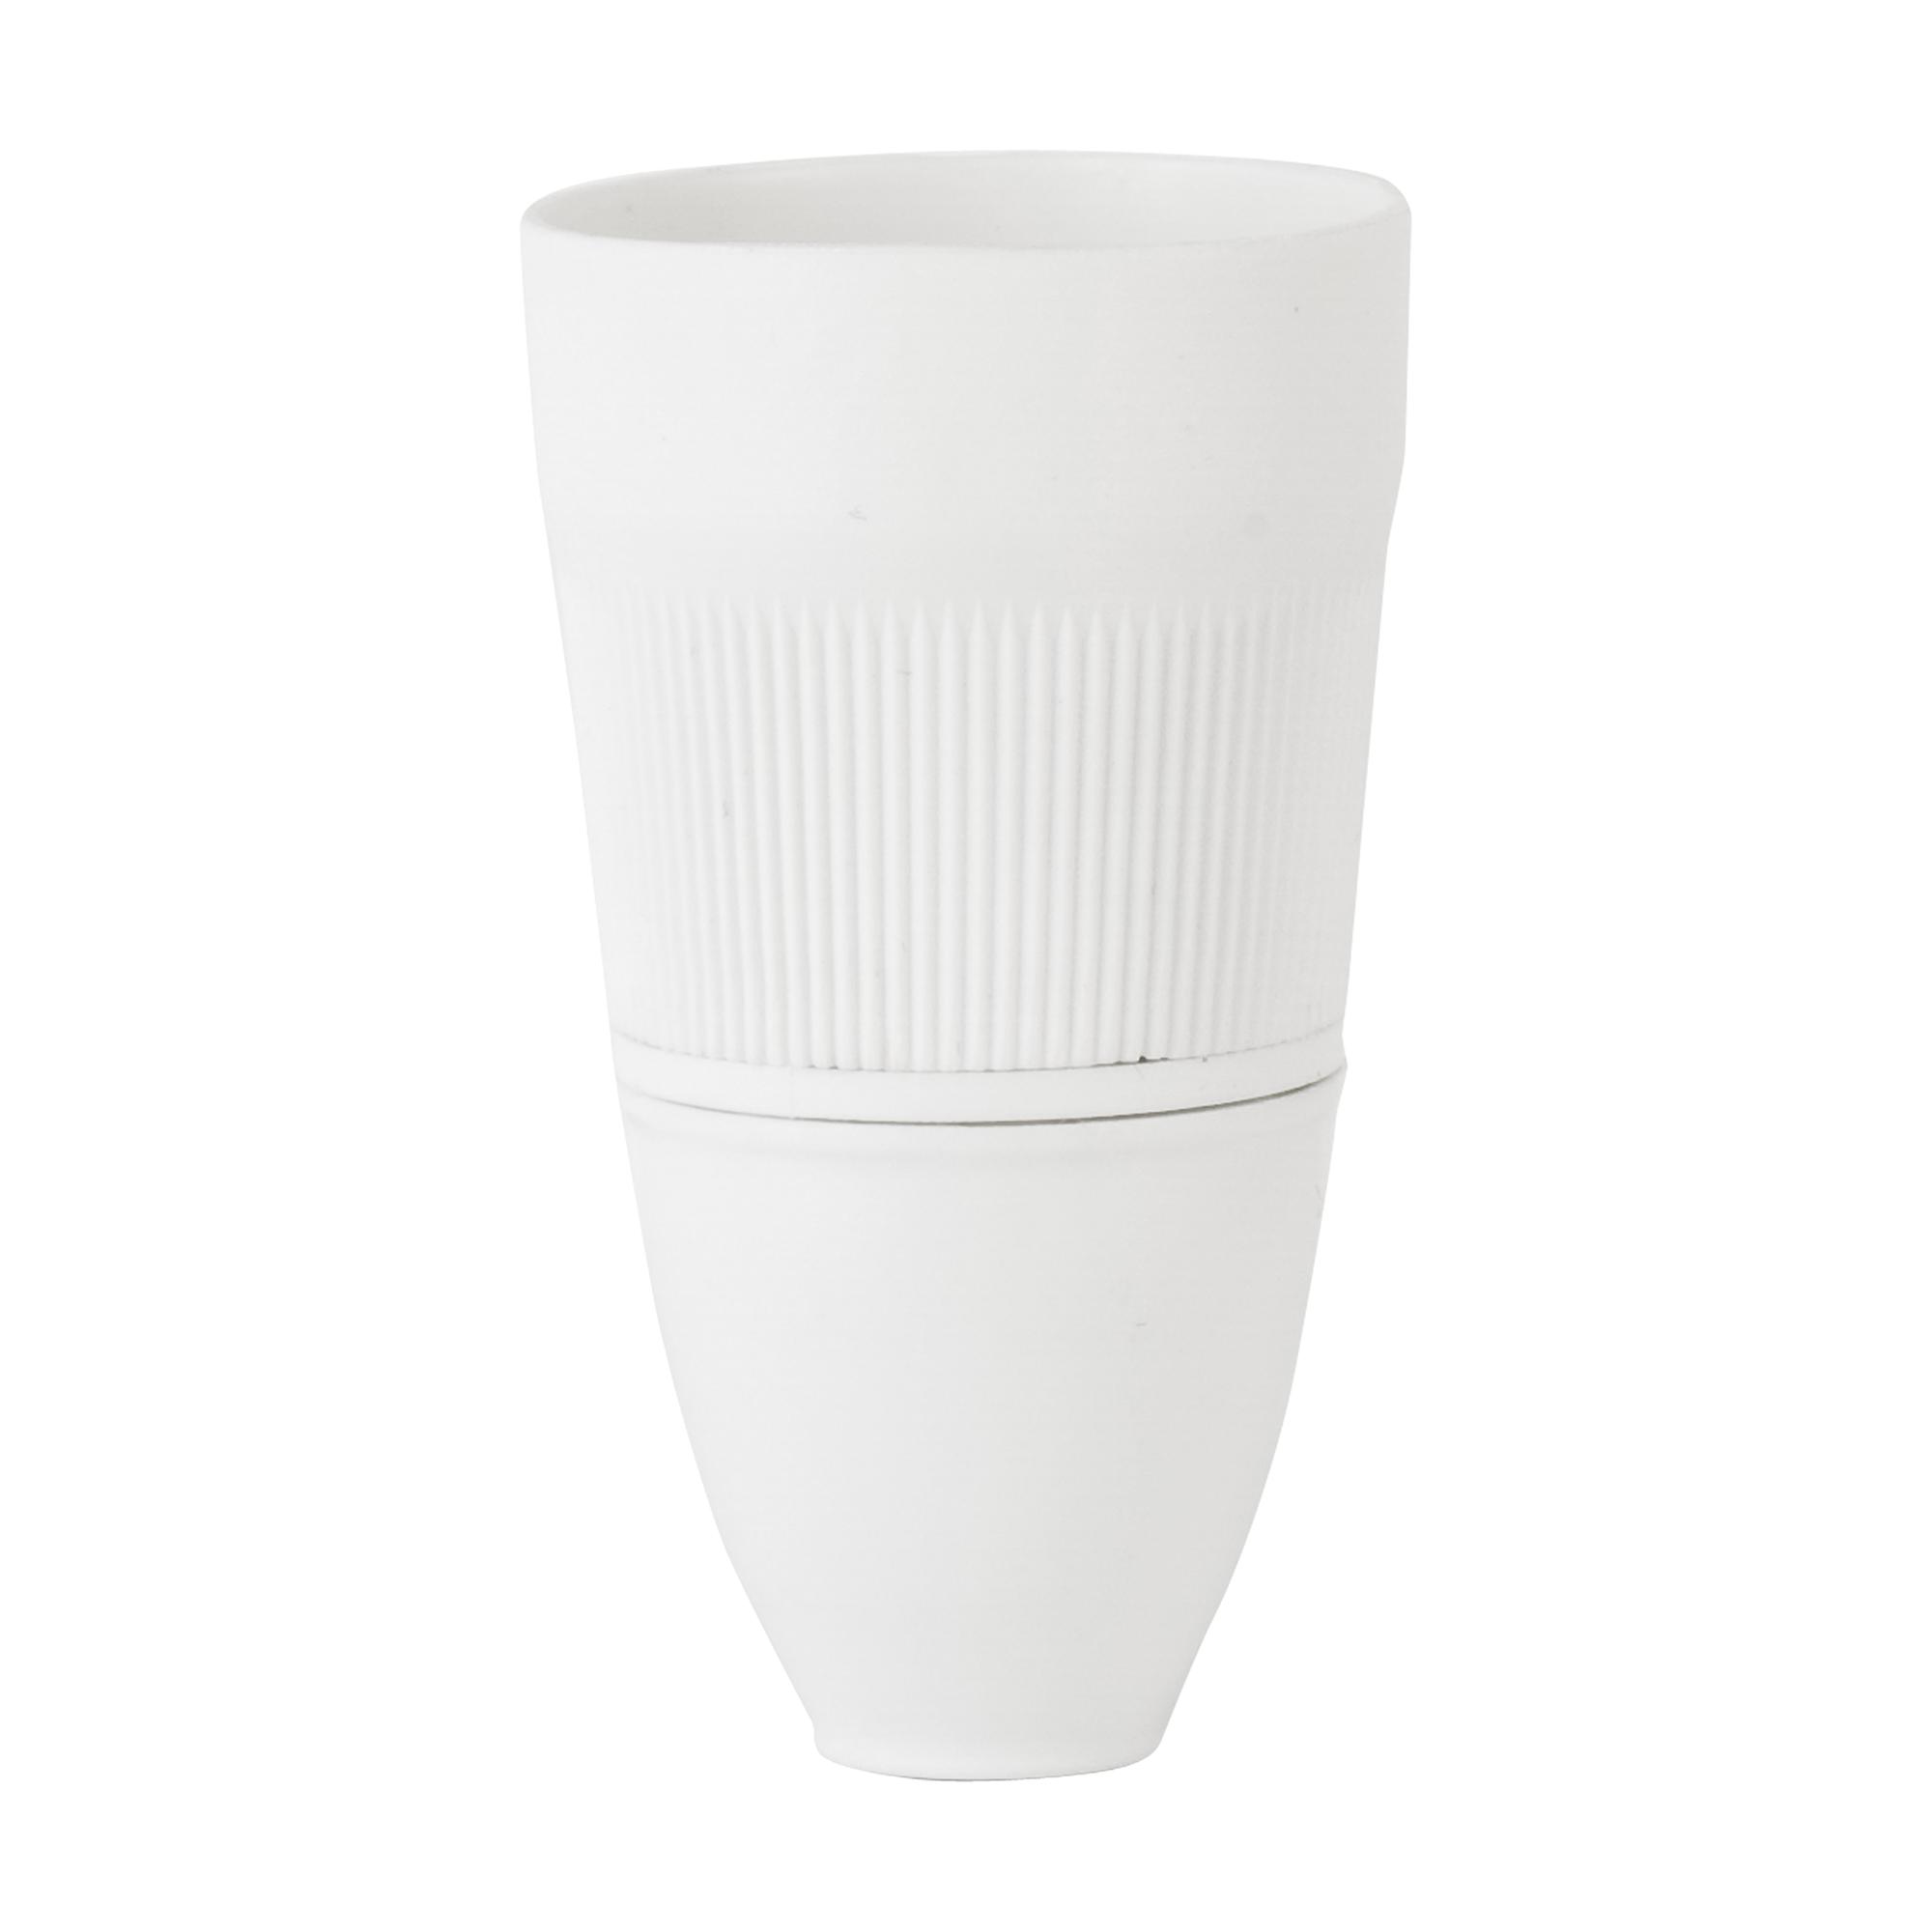 Deta suspension lampholder